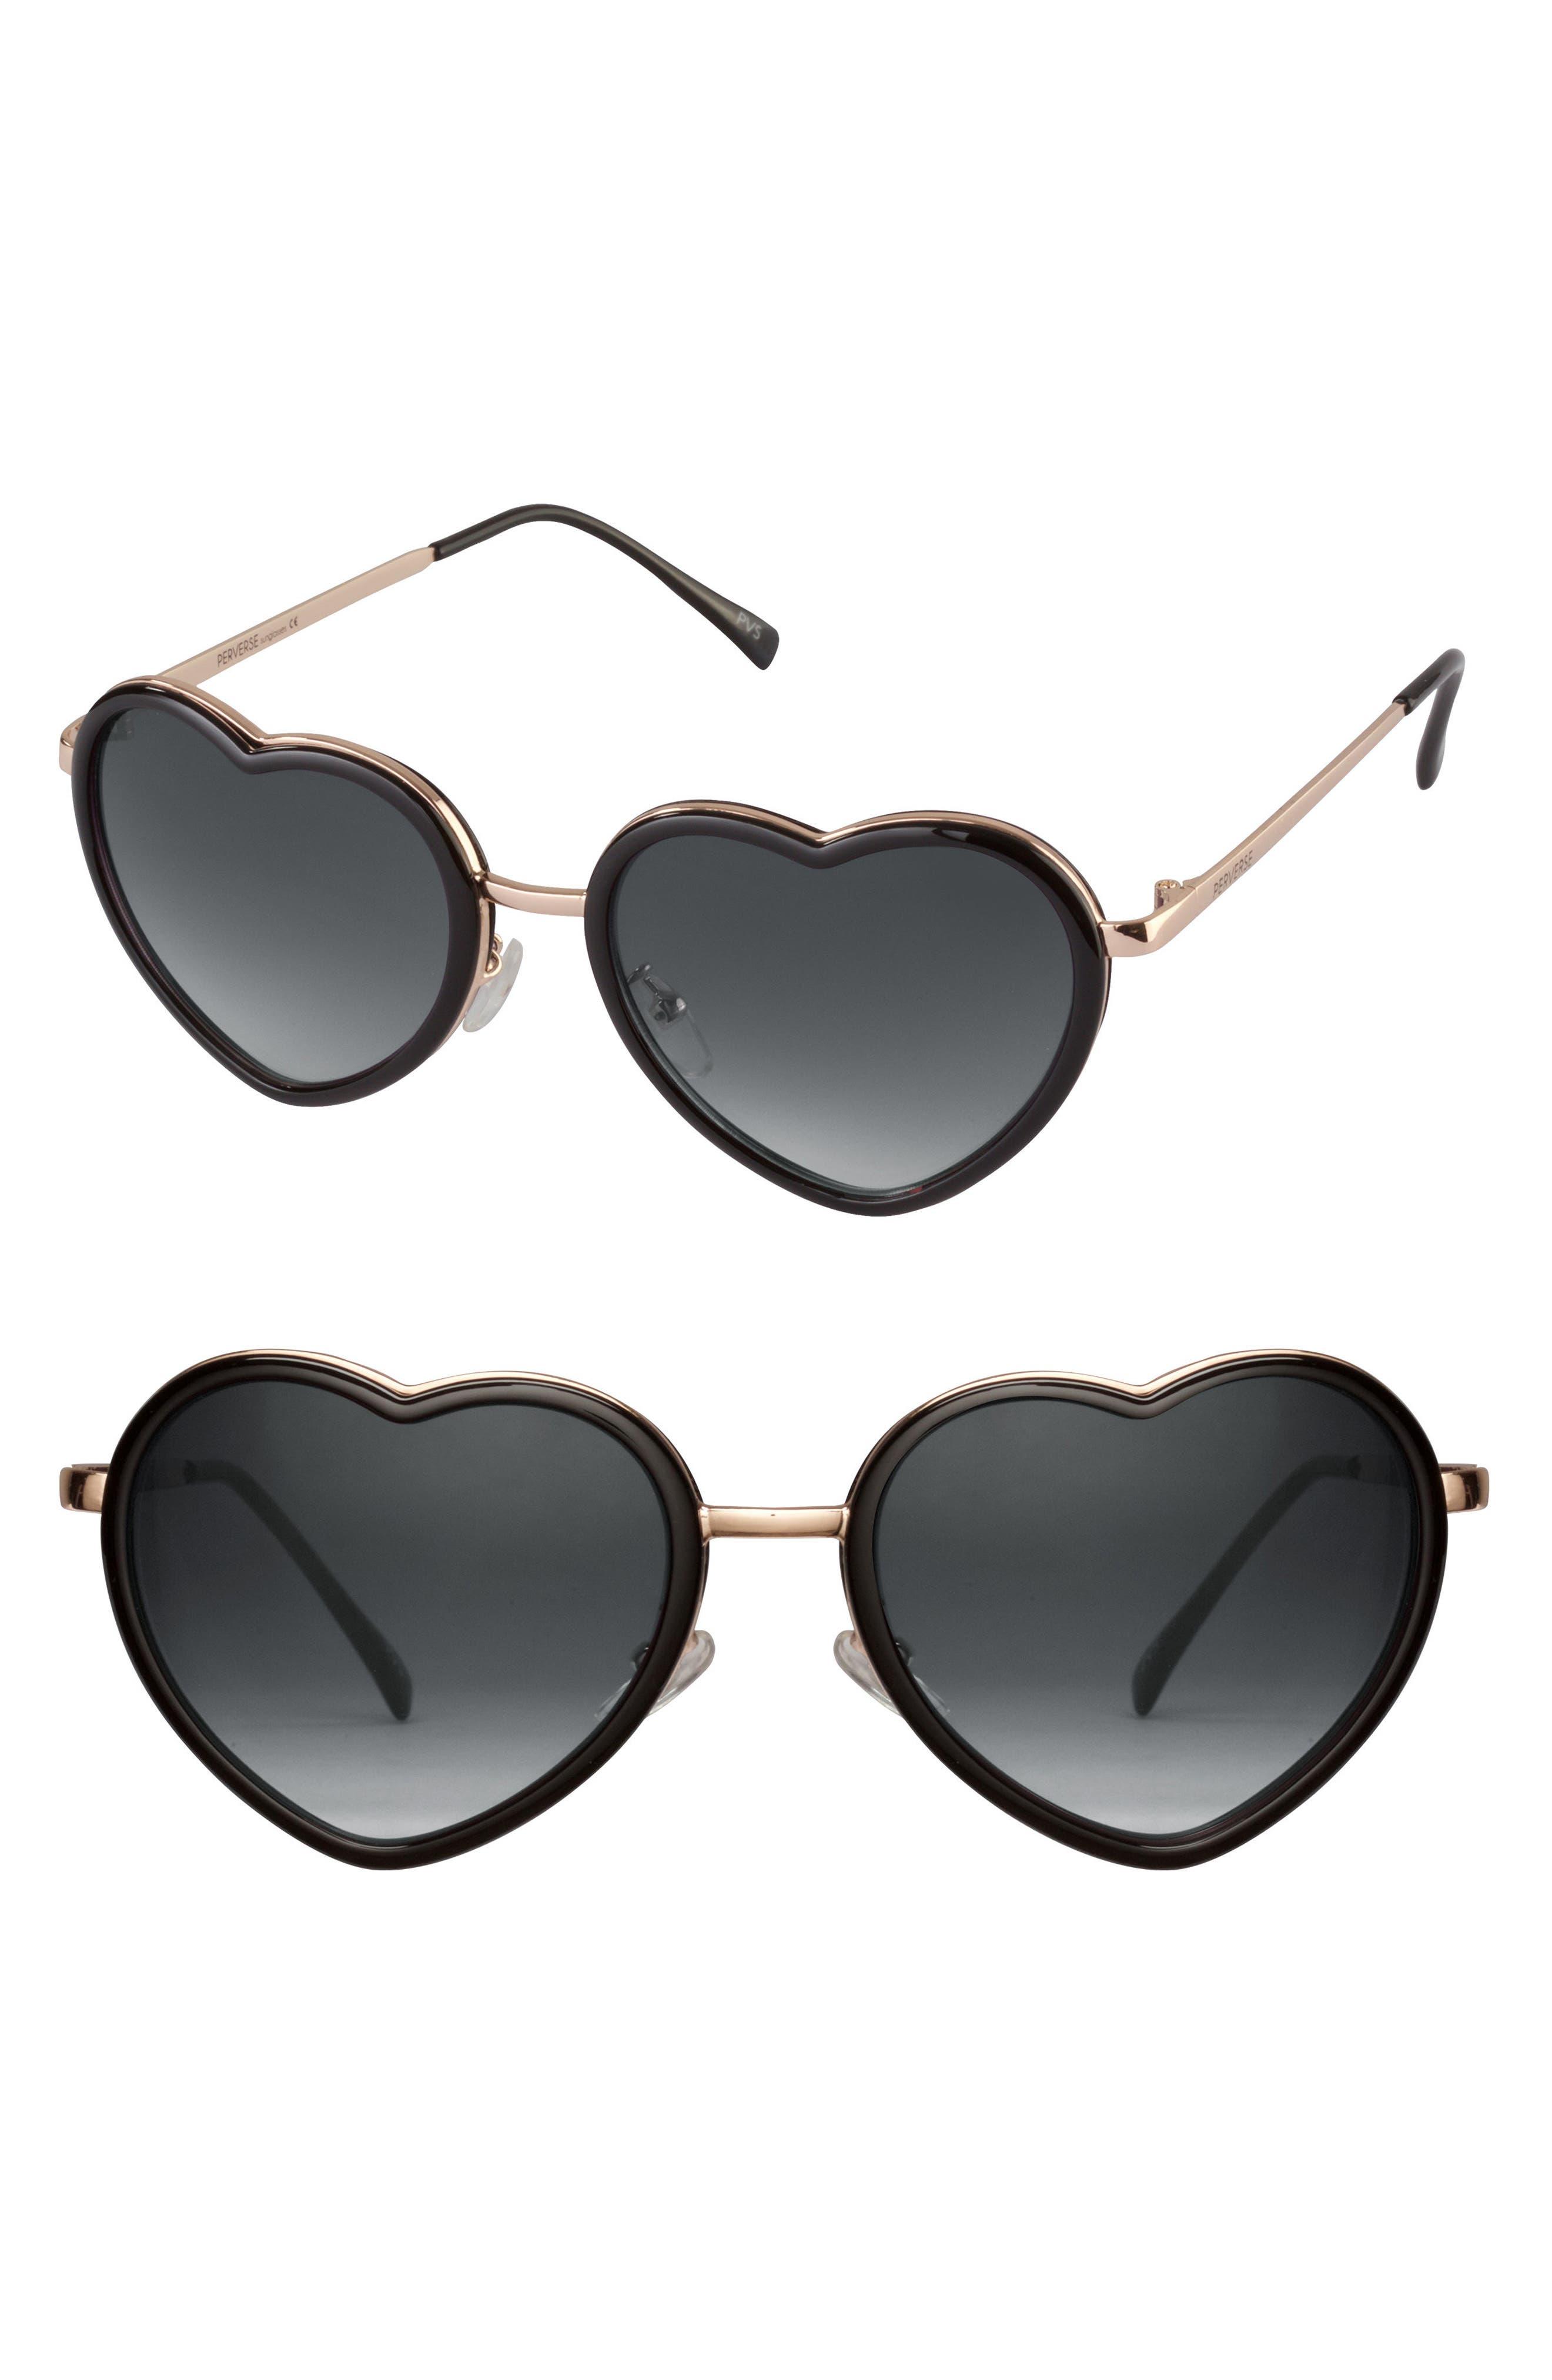 Poipu 52mm Heart Sunglasses,                         Main,                         color, Black